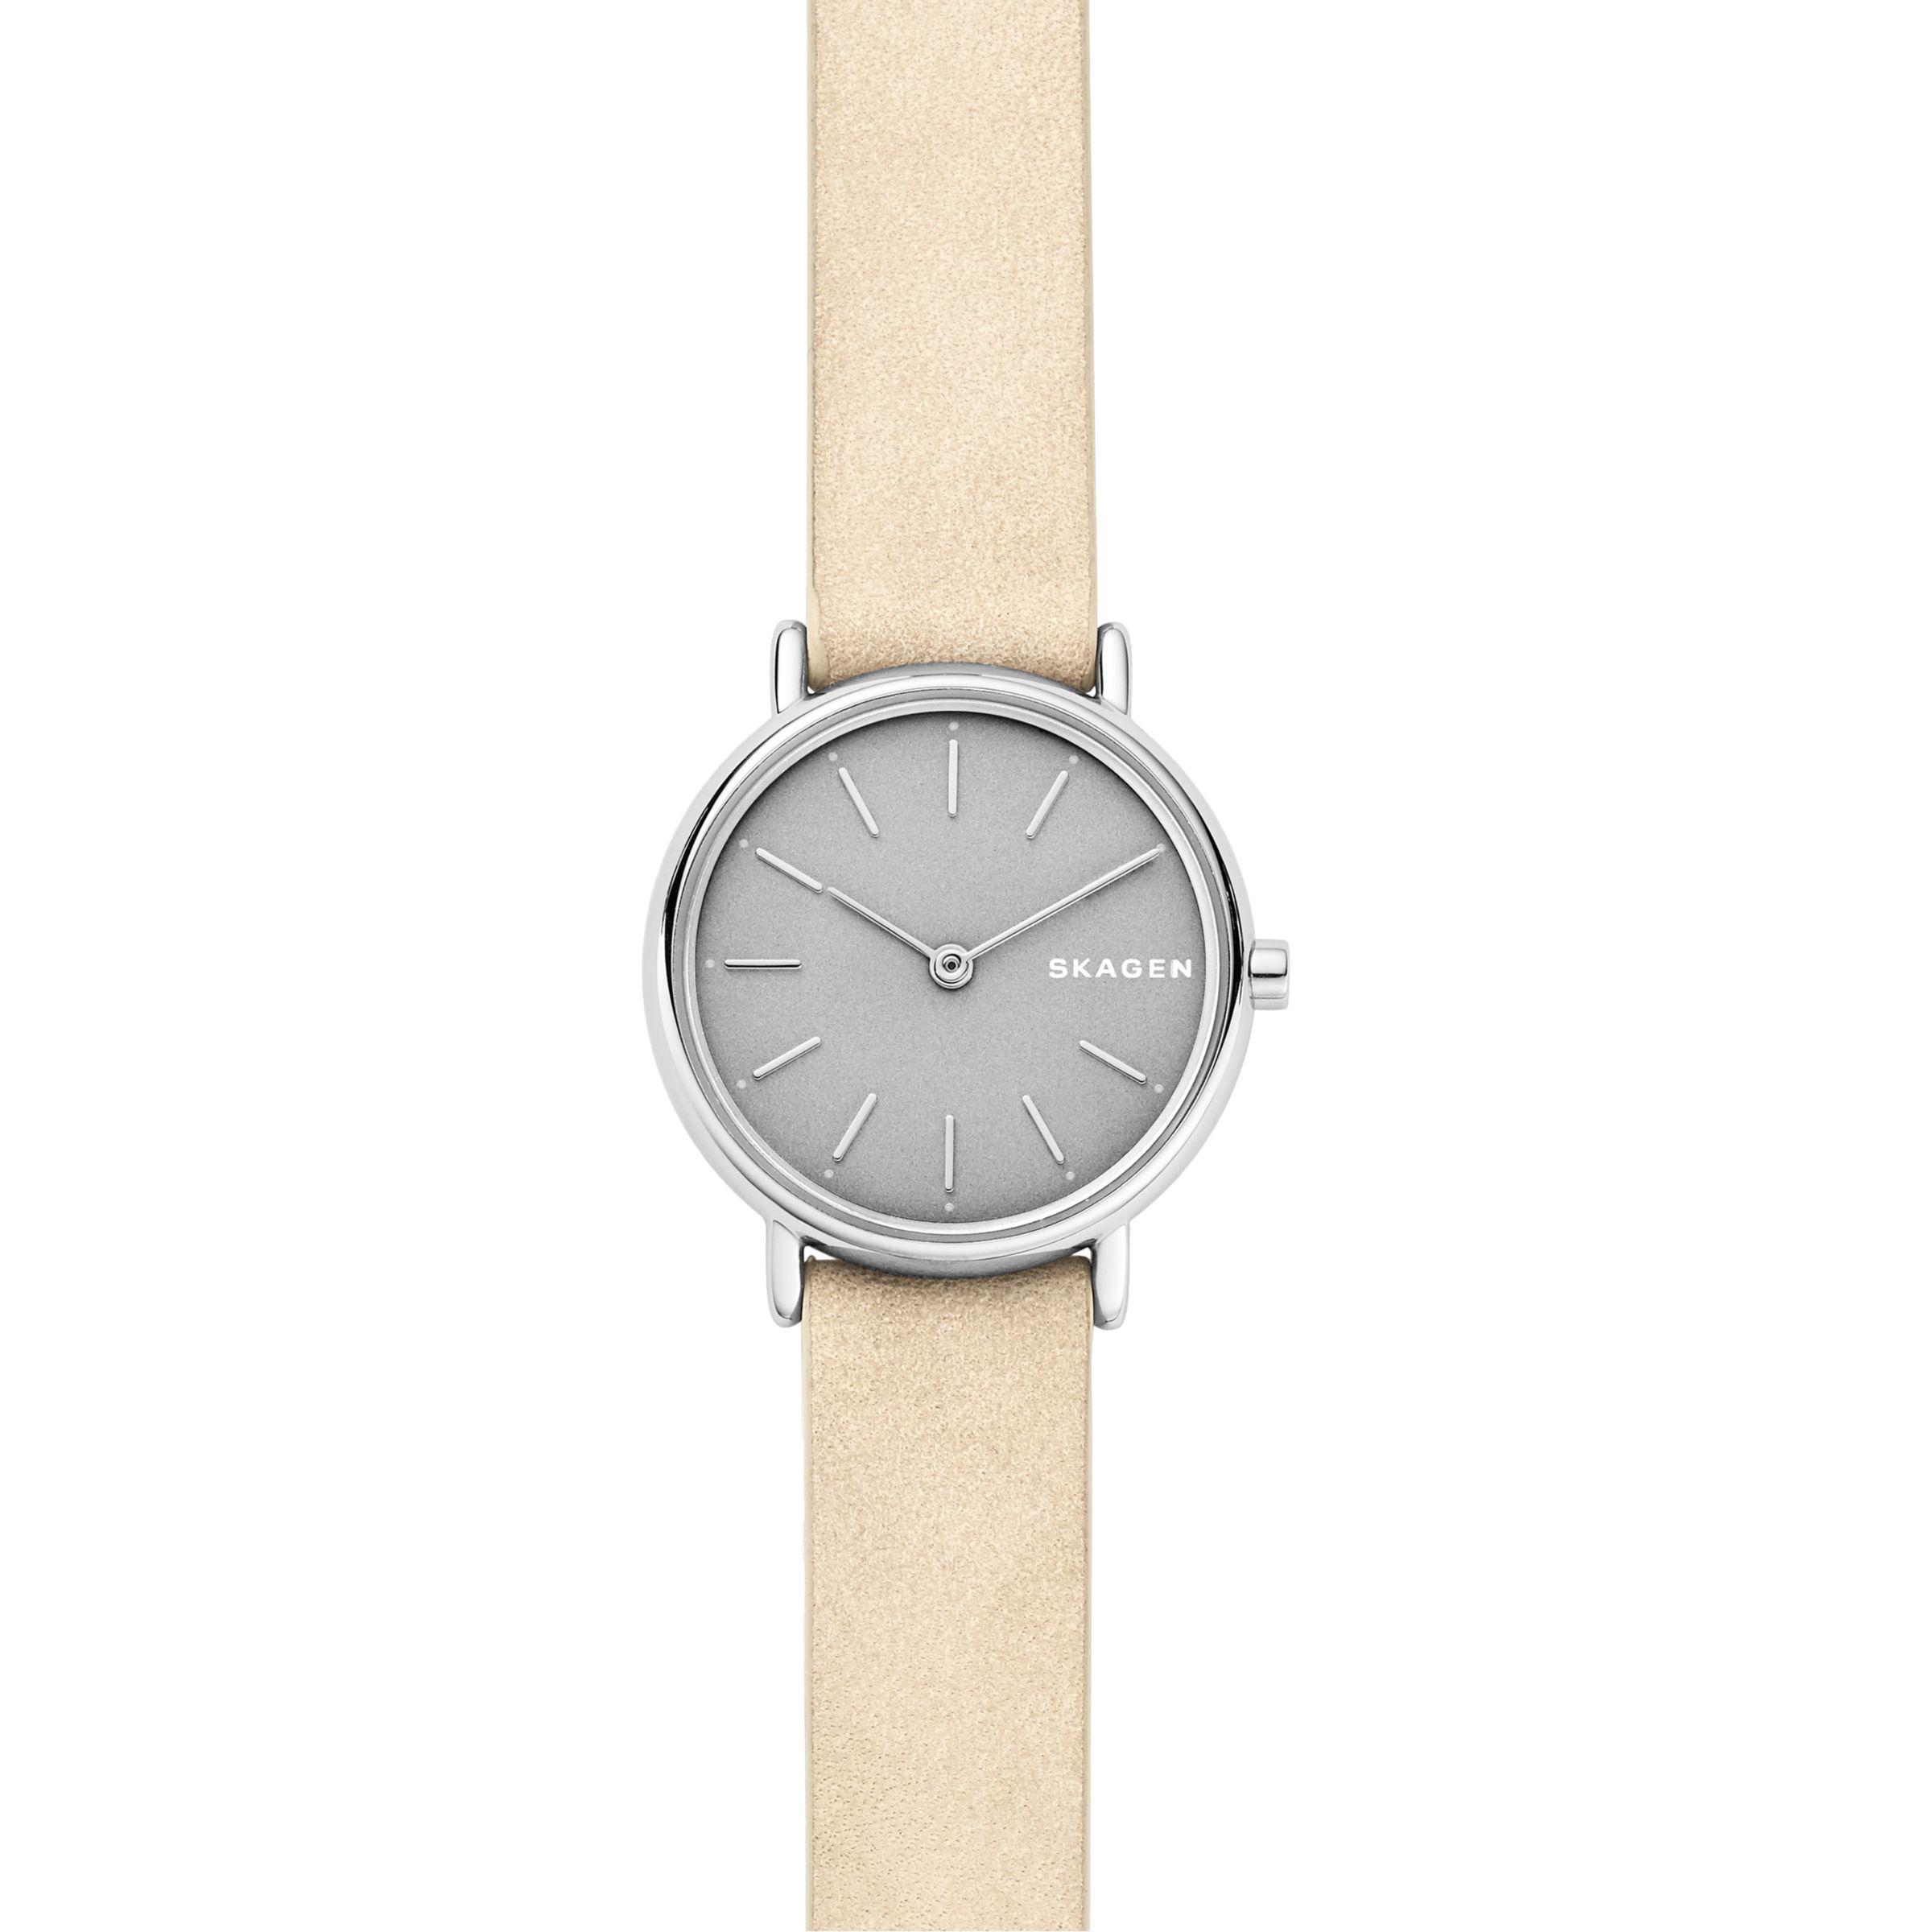 539bef397 Skagen Skw2696p Women's Signatur Slim Nubuck Leather Watch in ...